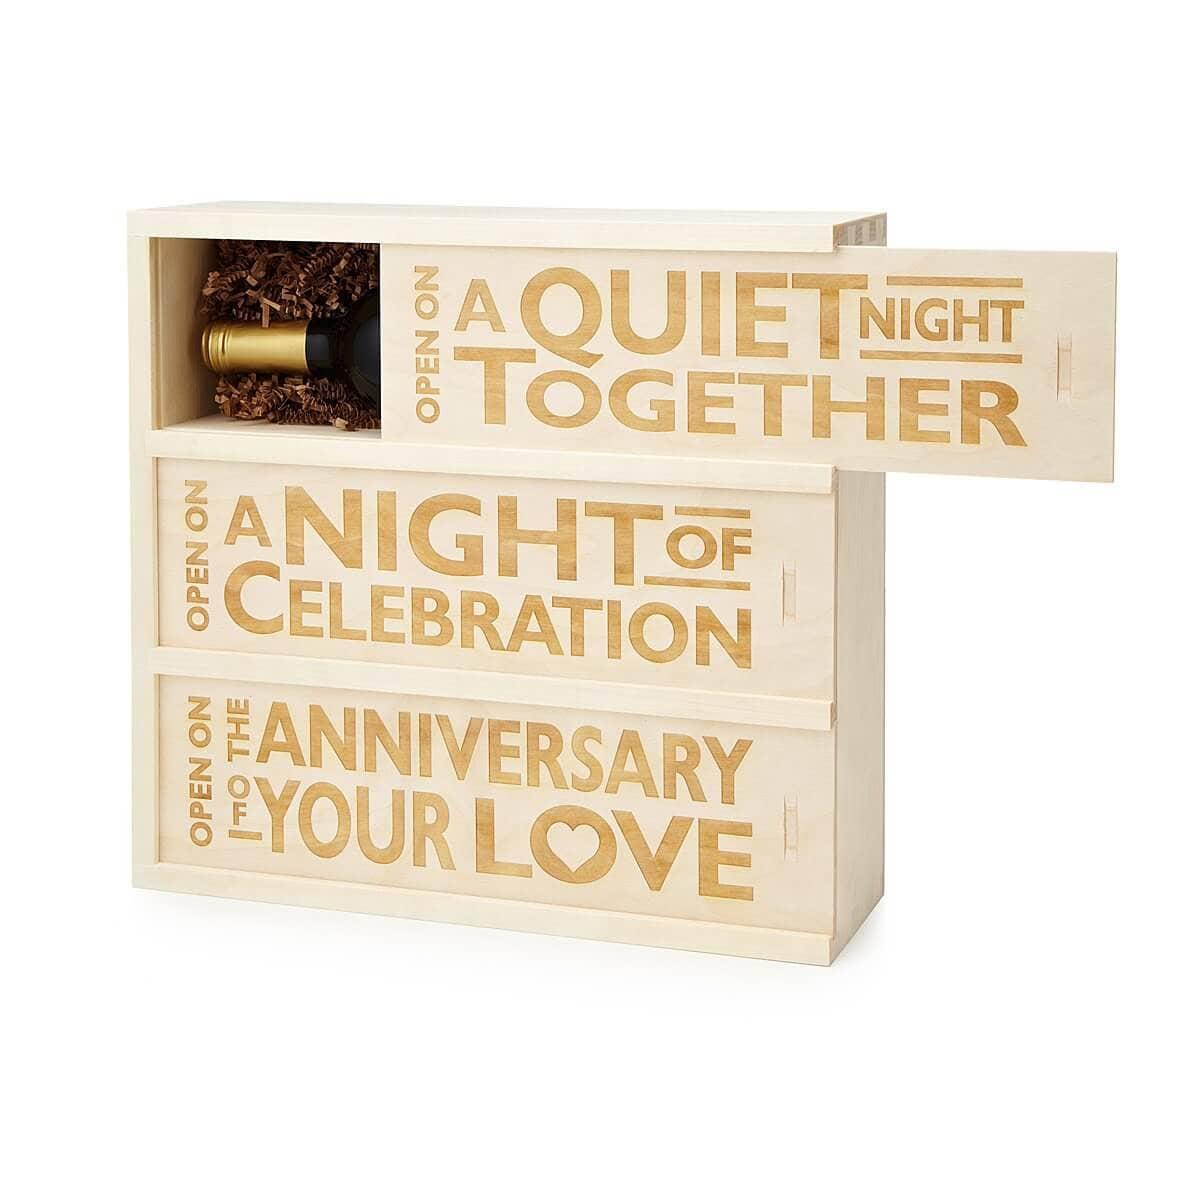 Three Nights Wine Box Set